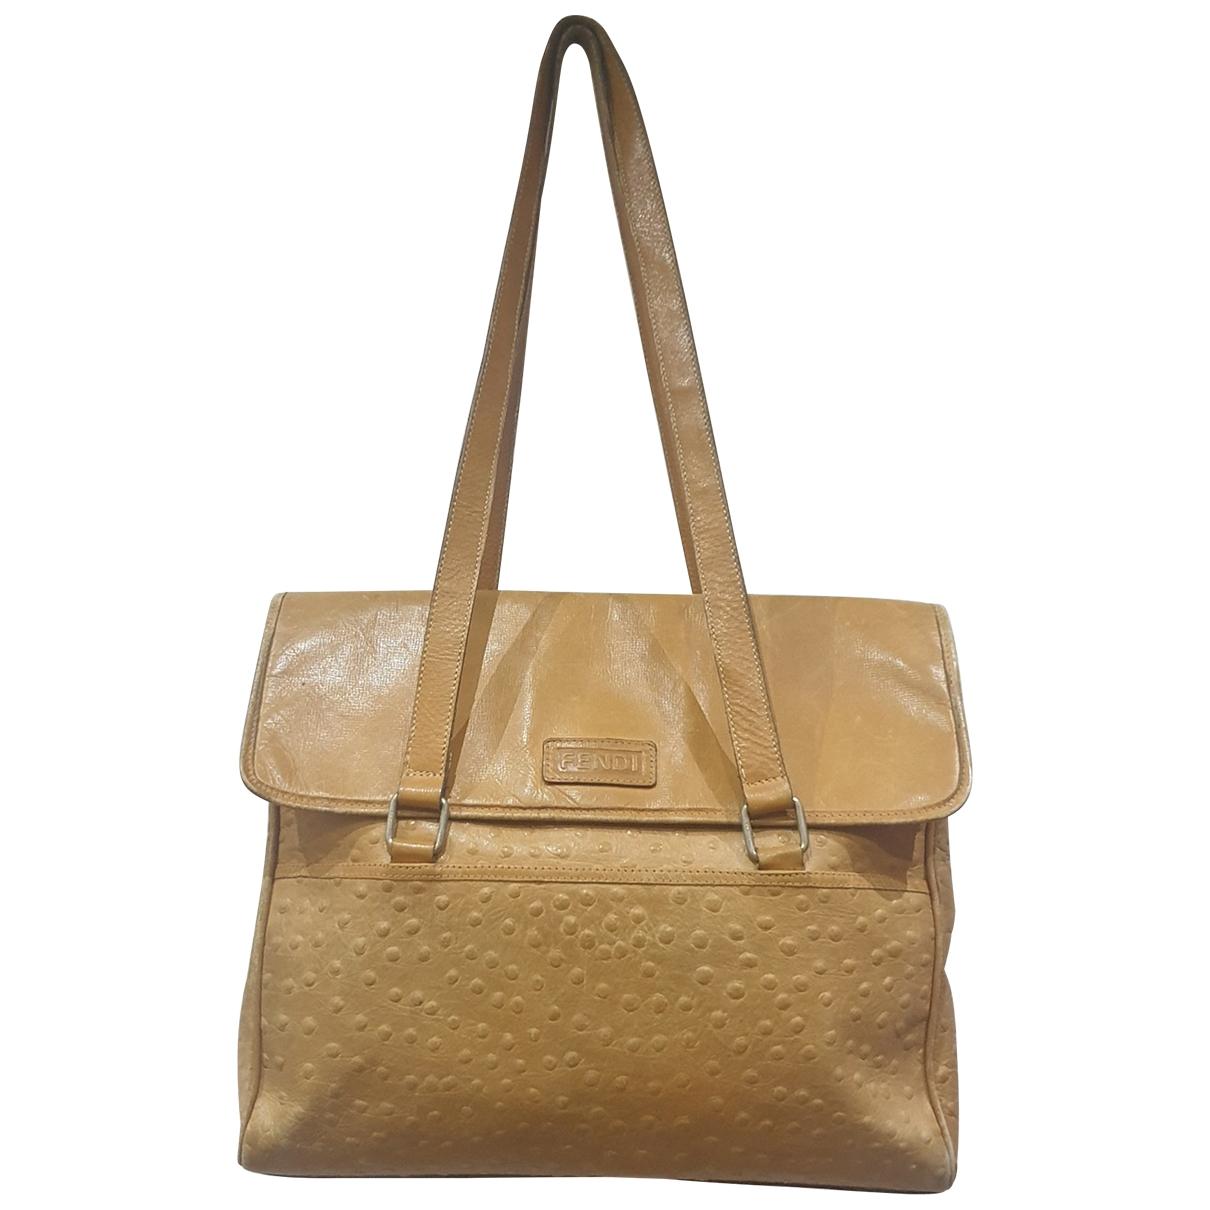 Fendi \N Beige Leather handbag for Women \N